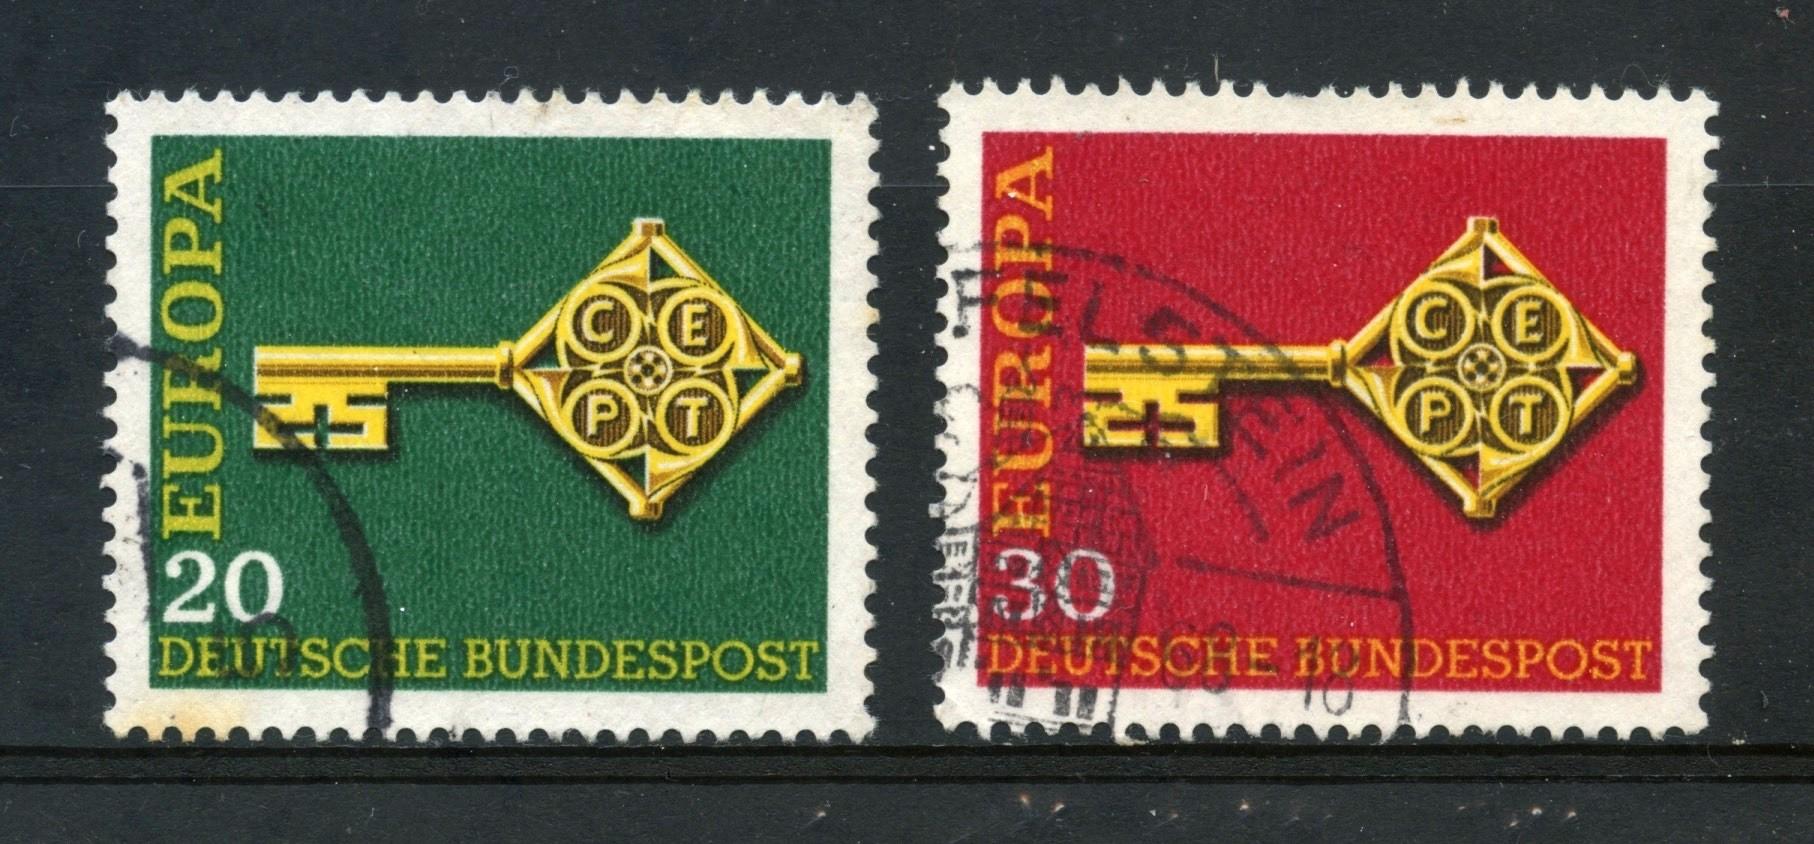 Lotto Germania 6 49